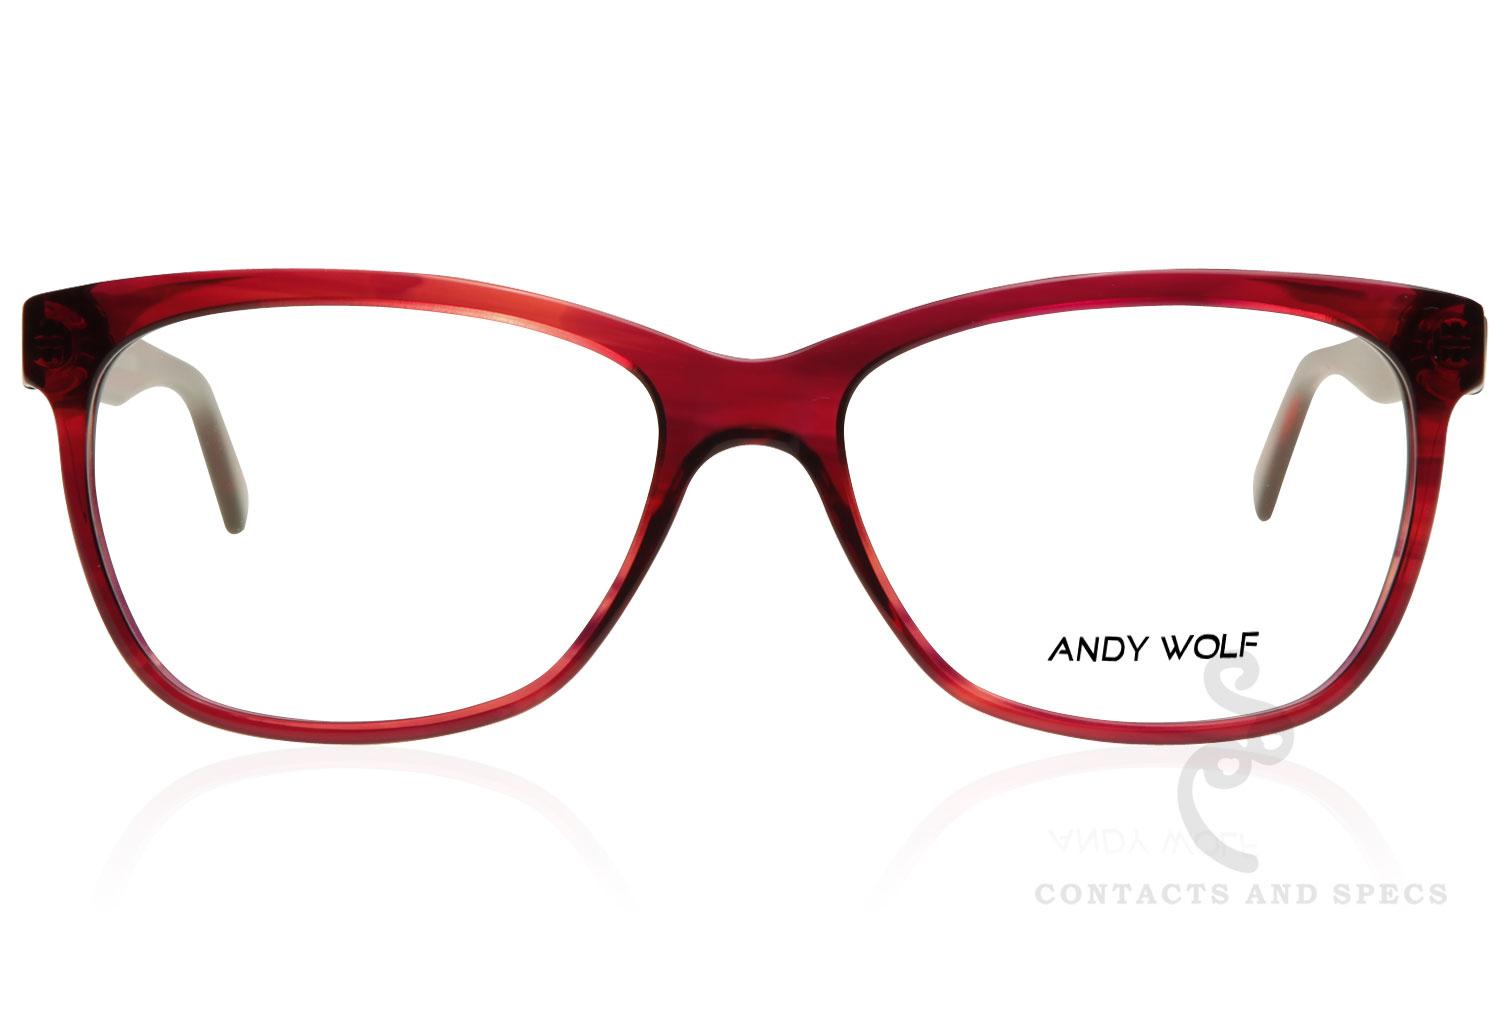 Andy Wolf Eyewear 5036